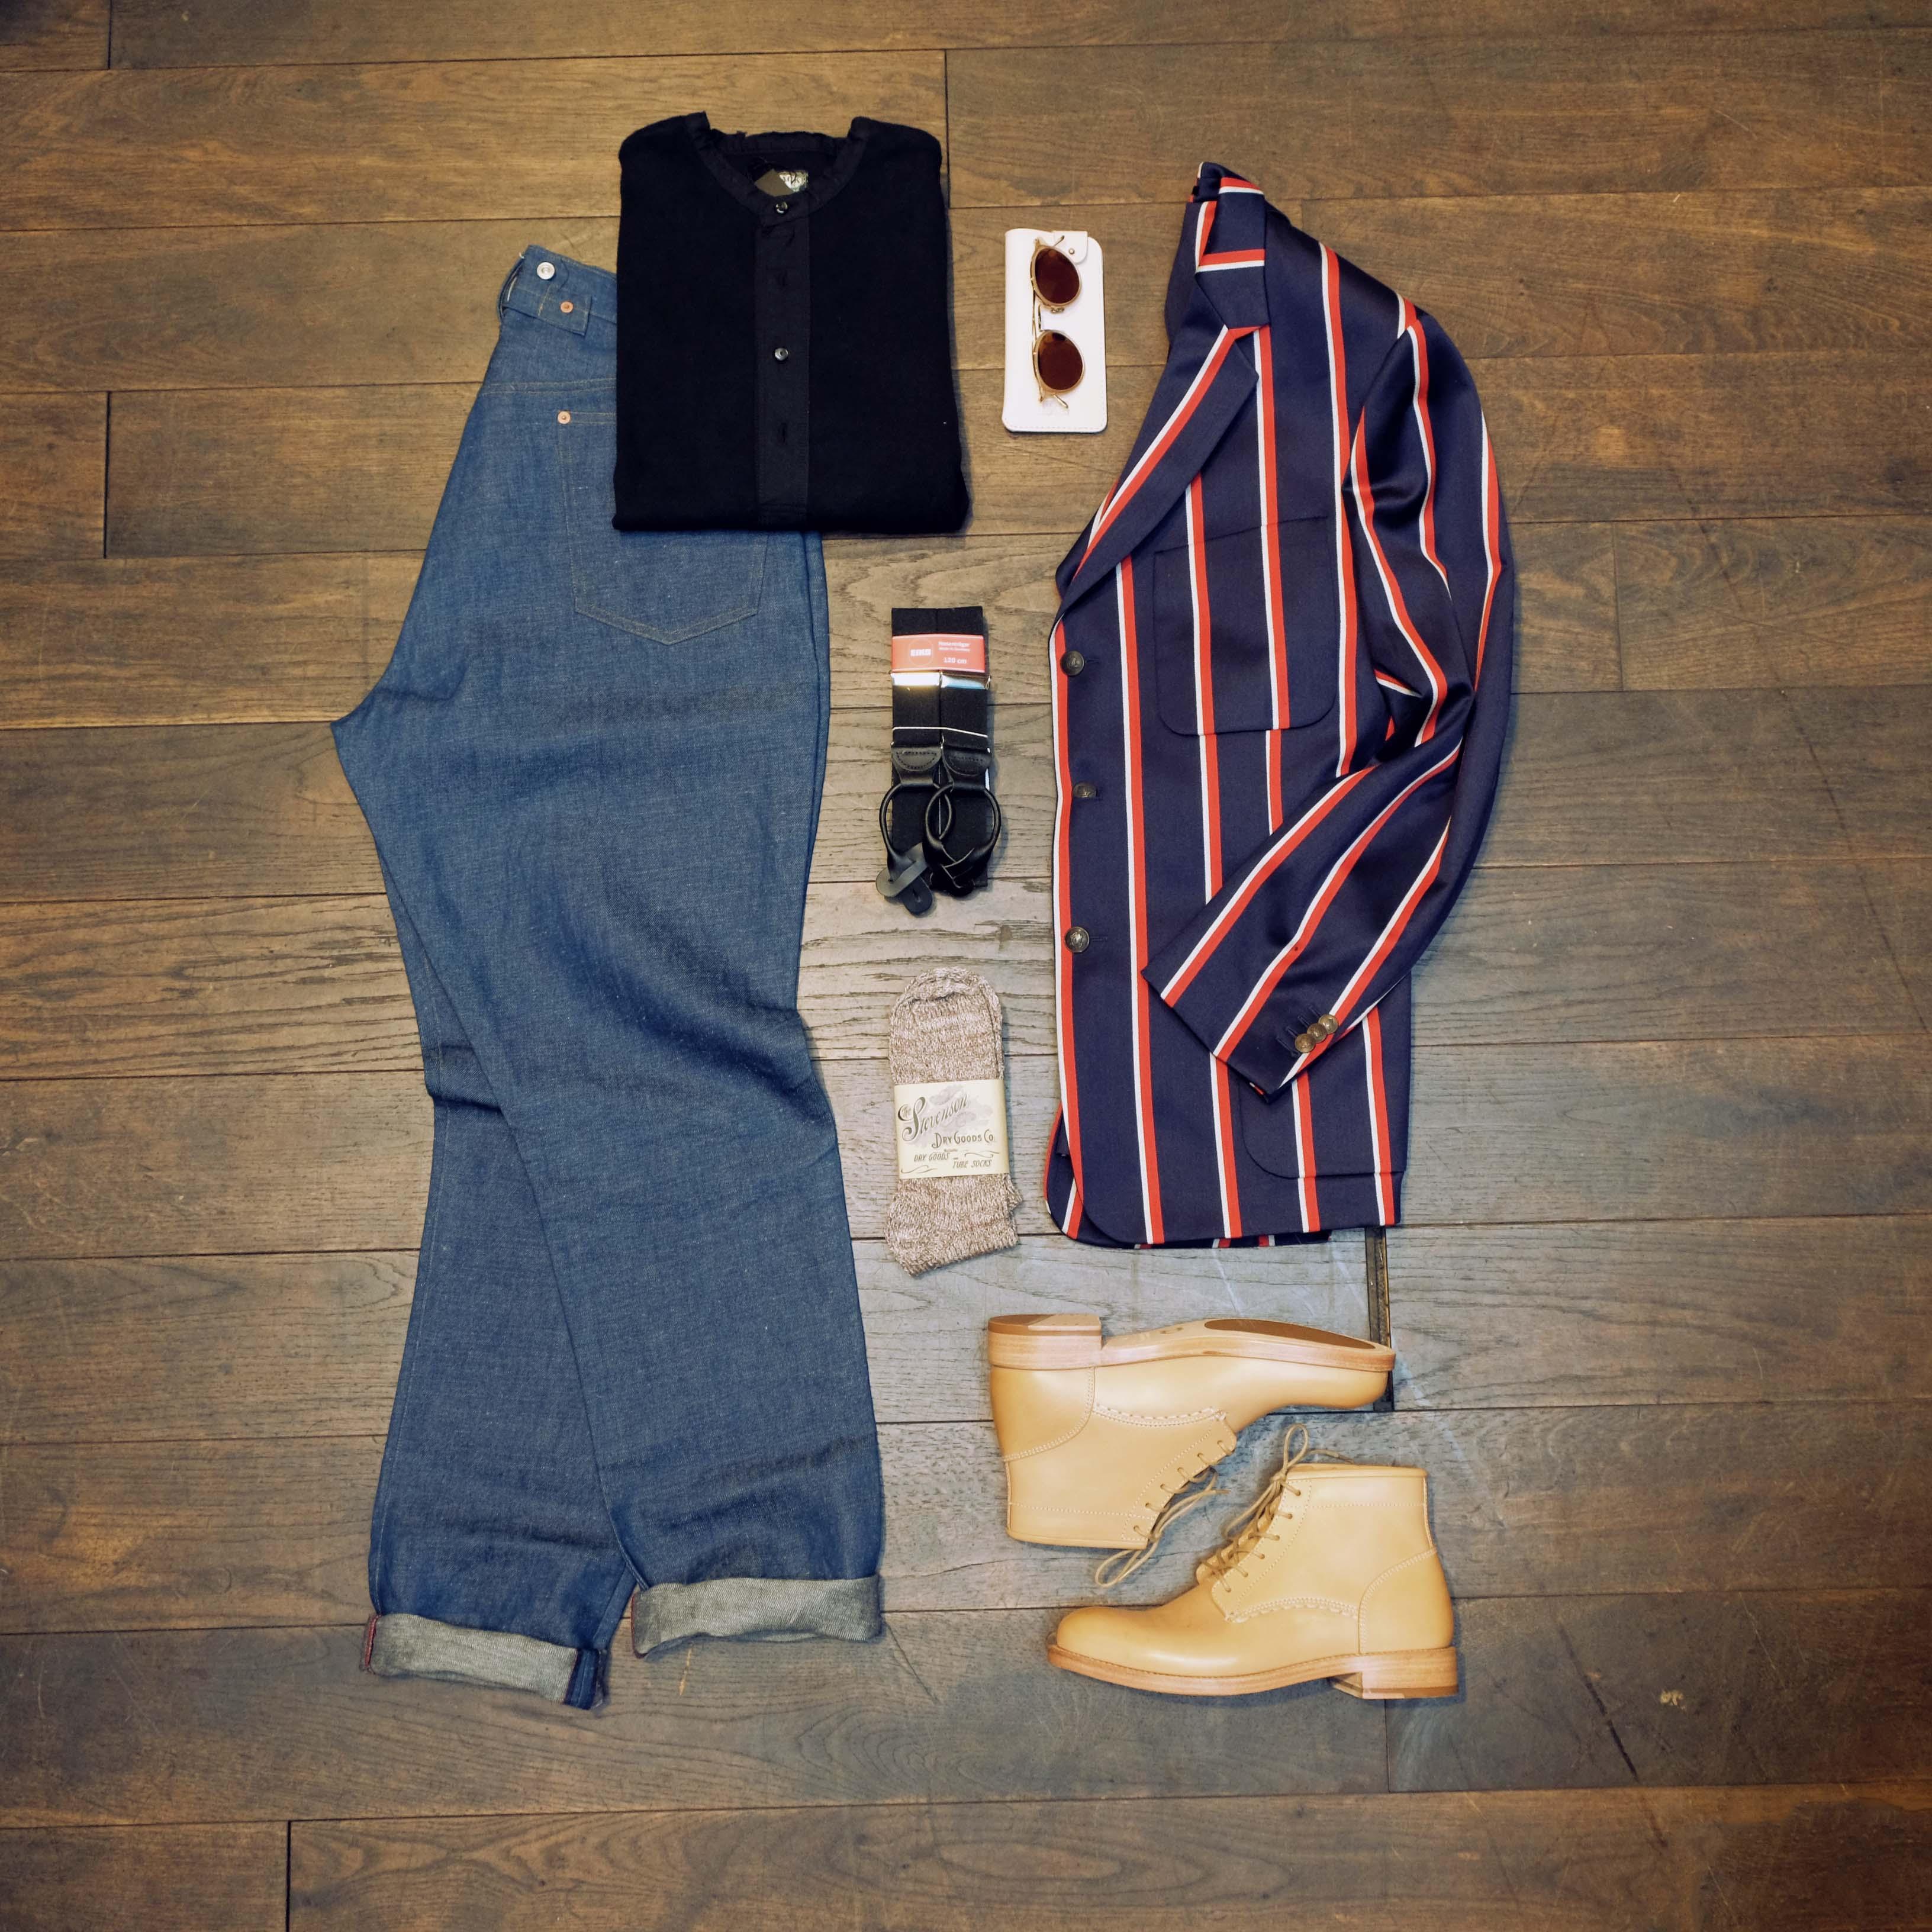 outfit-der-woche-tommy-page-haversack-wildwerk-blacksign-stevensonoverall-eiko-buttsandshoulders